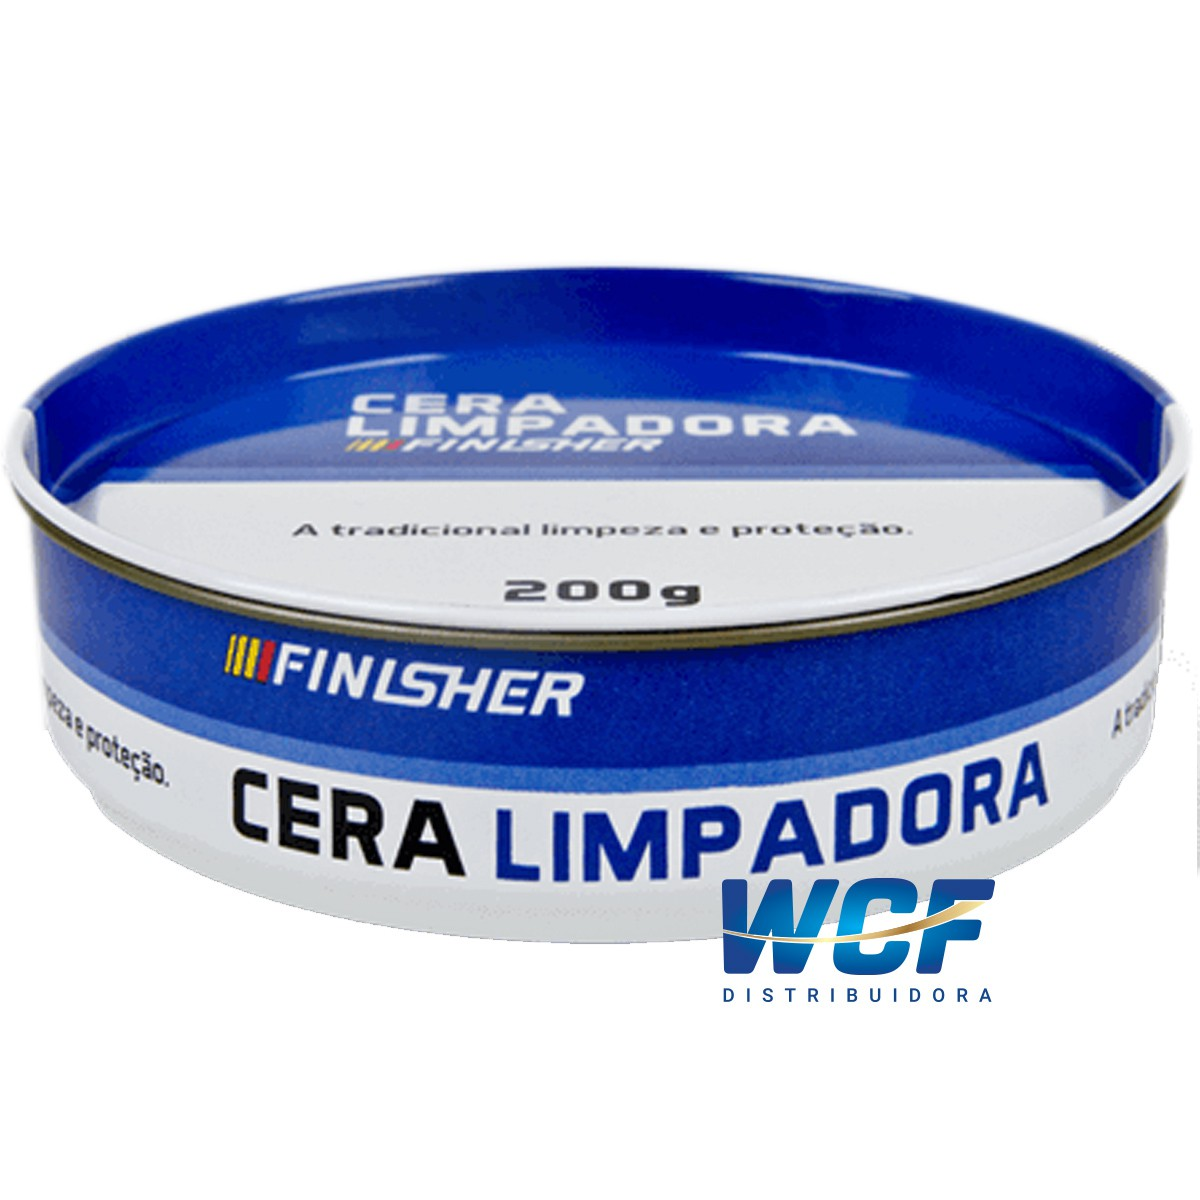 CERA LIMPADORA 200 G FINISHER